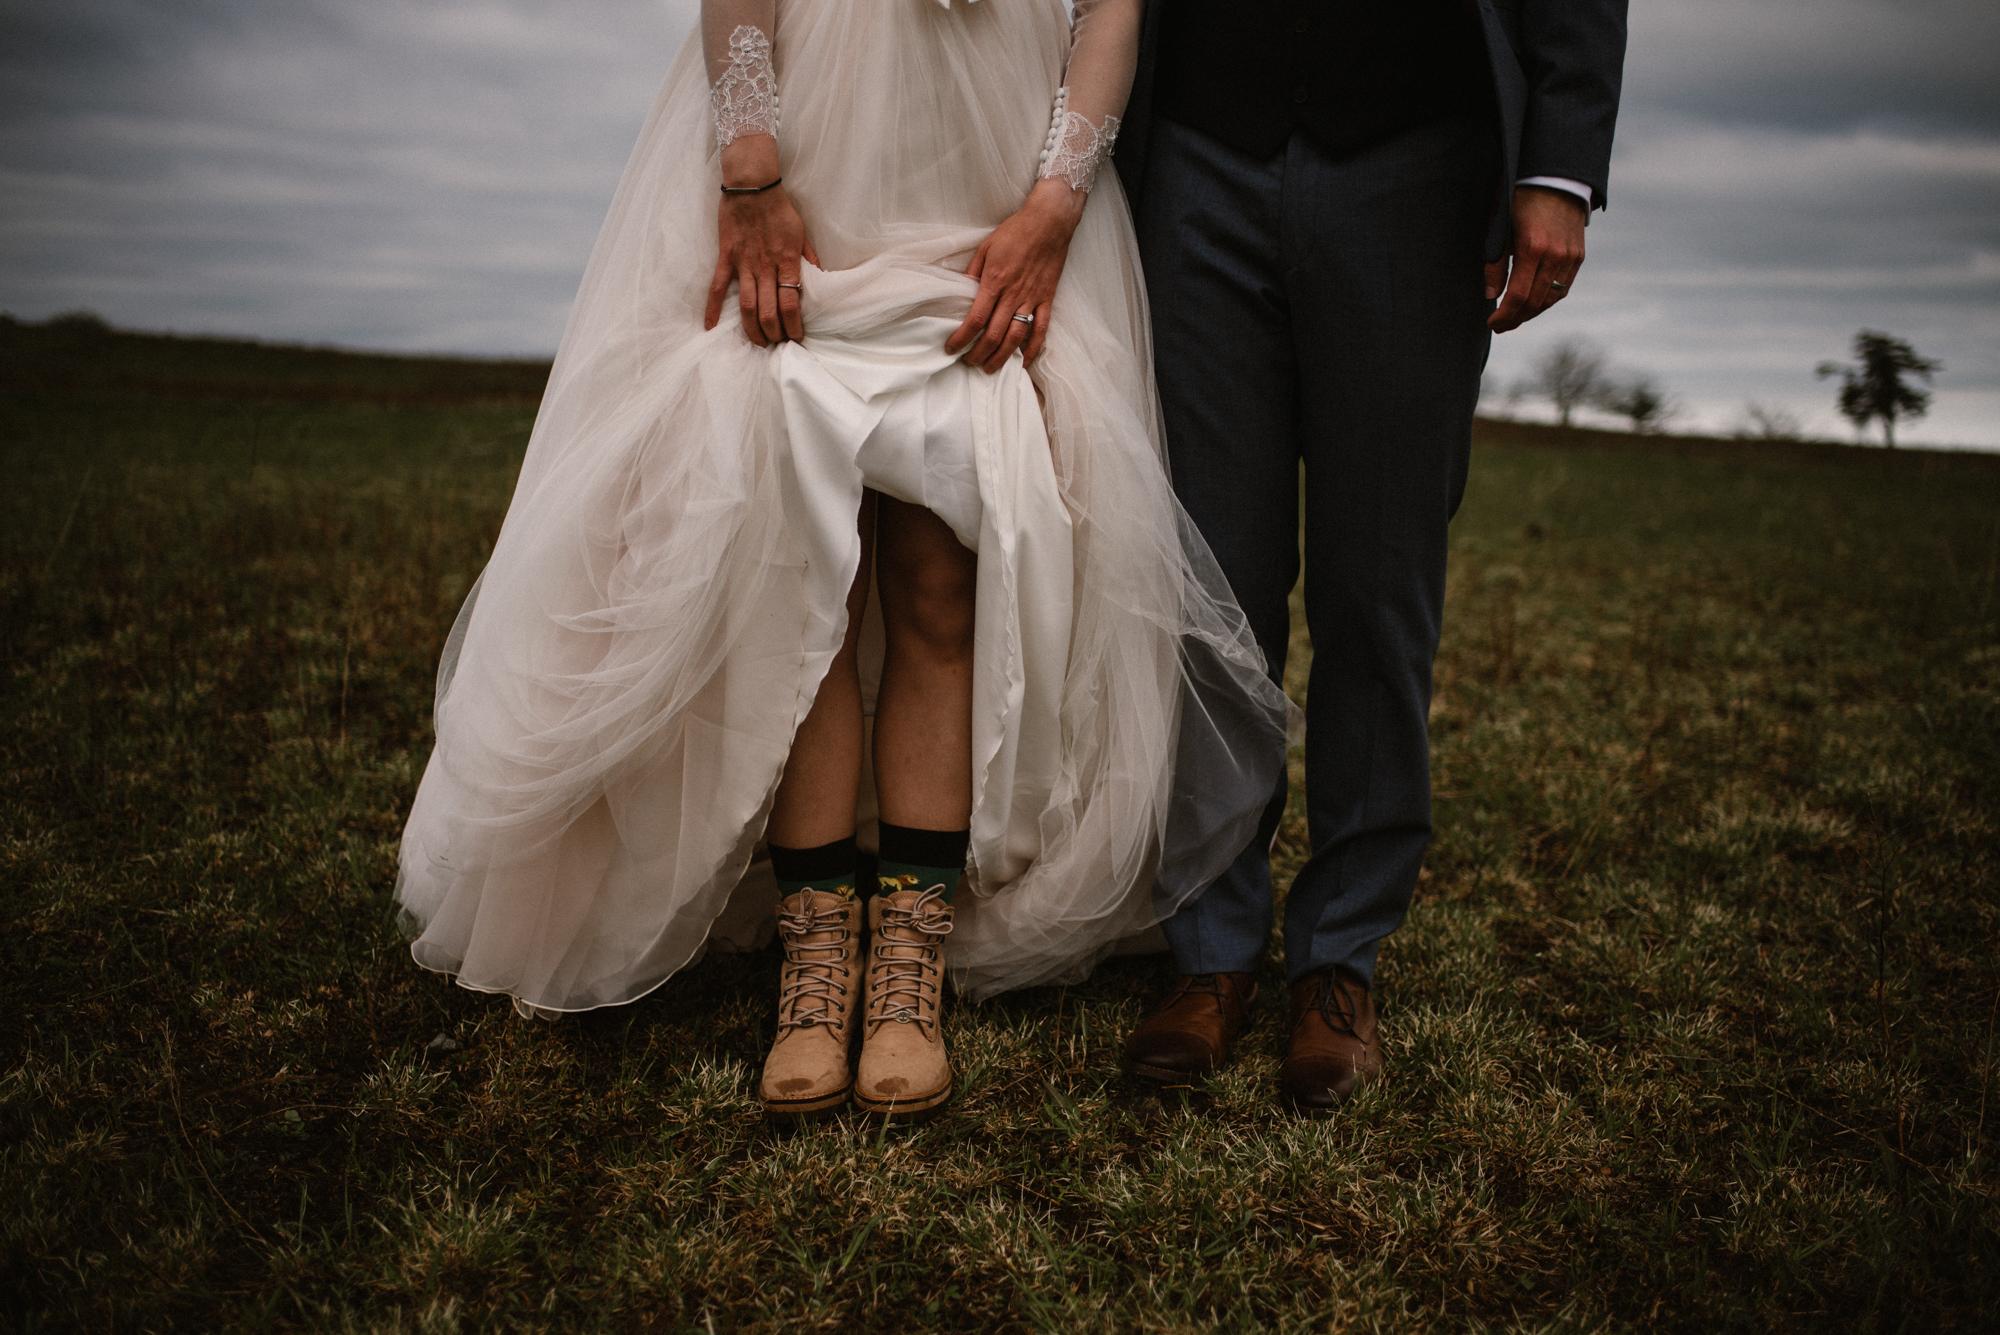 Paula and Andrew - Small Adventurous Wedding in Shenandoah National Park - Blue Ridge Mountain Wedding - White Sails Creative - Mountain Elopement_35.jpg